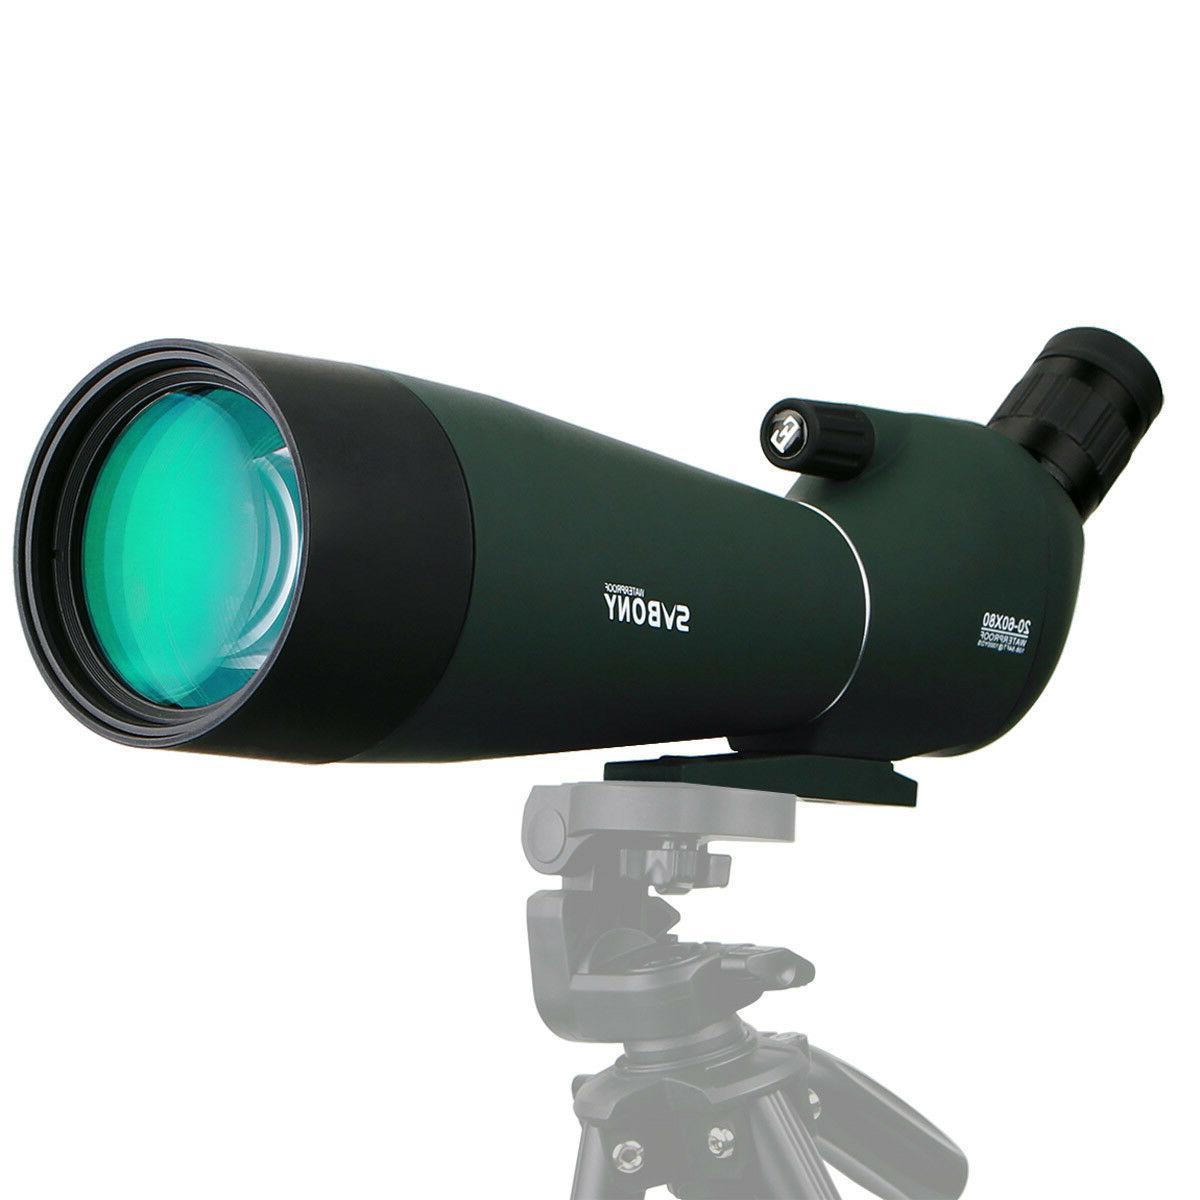 SVBONY SV28 20-60x80 Angled Spotting Bird watching US